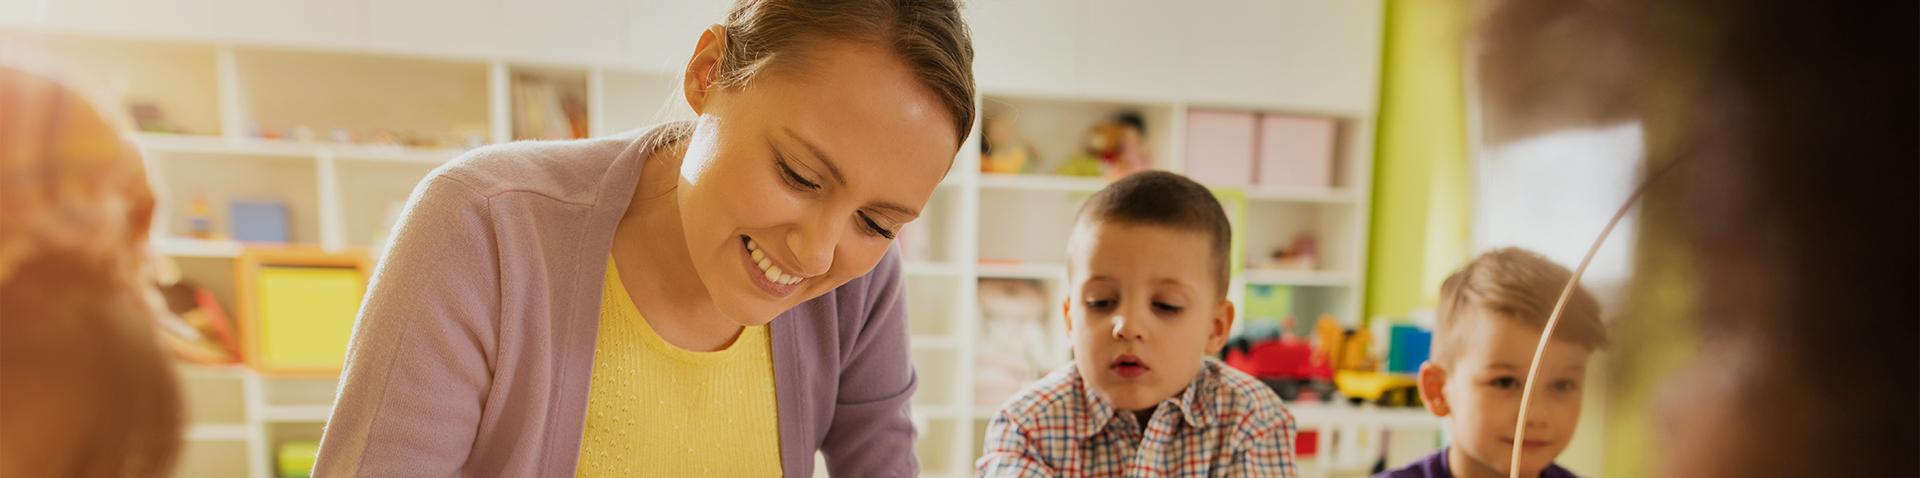 Hiring Early Childhood Educators